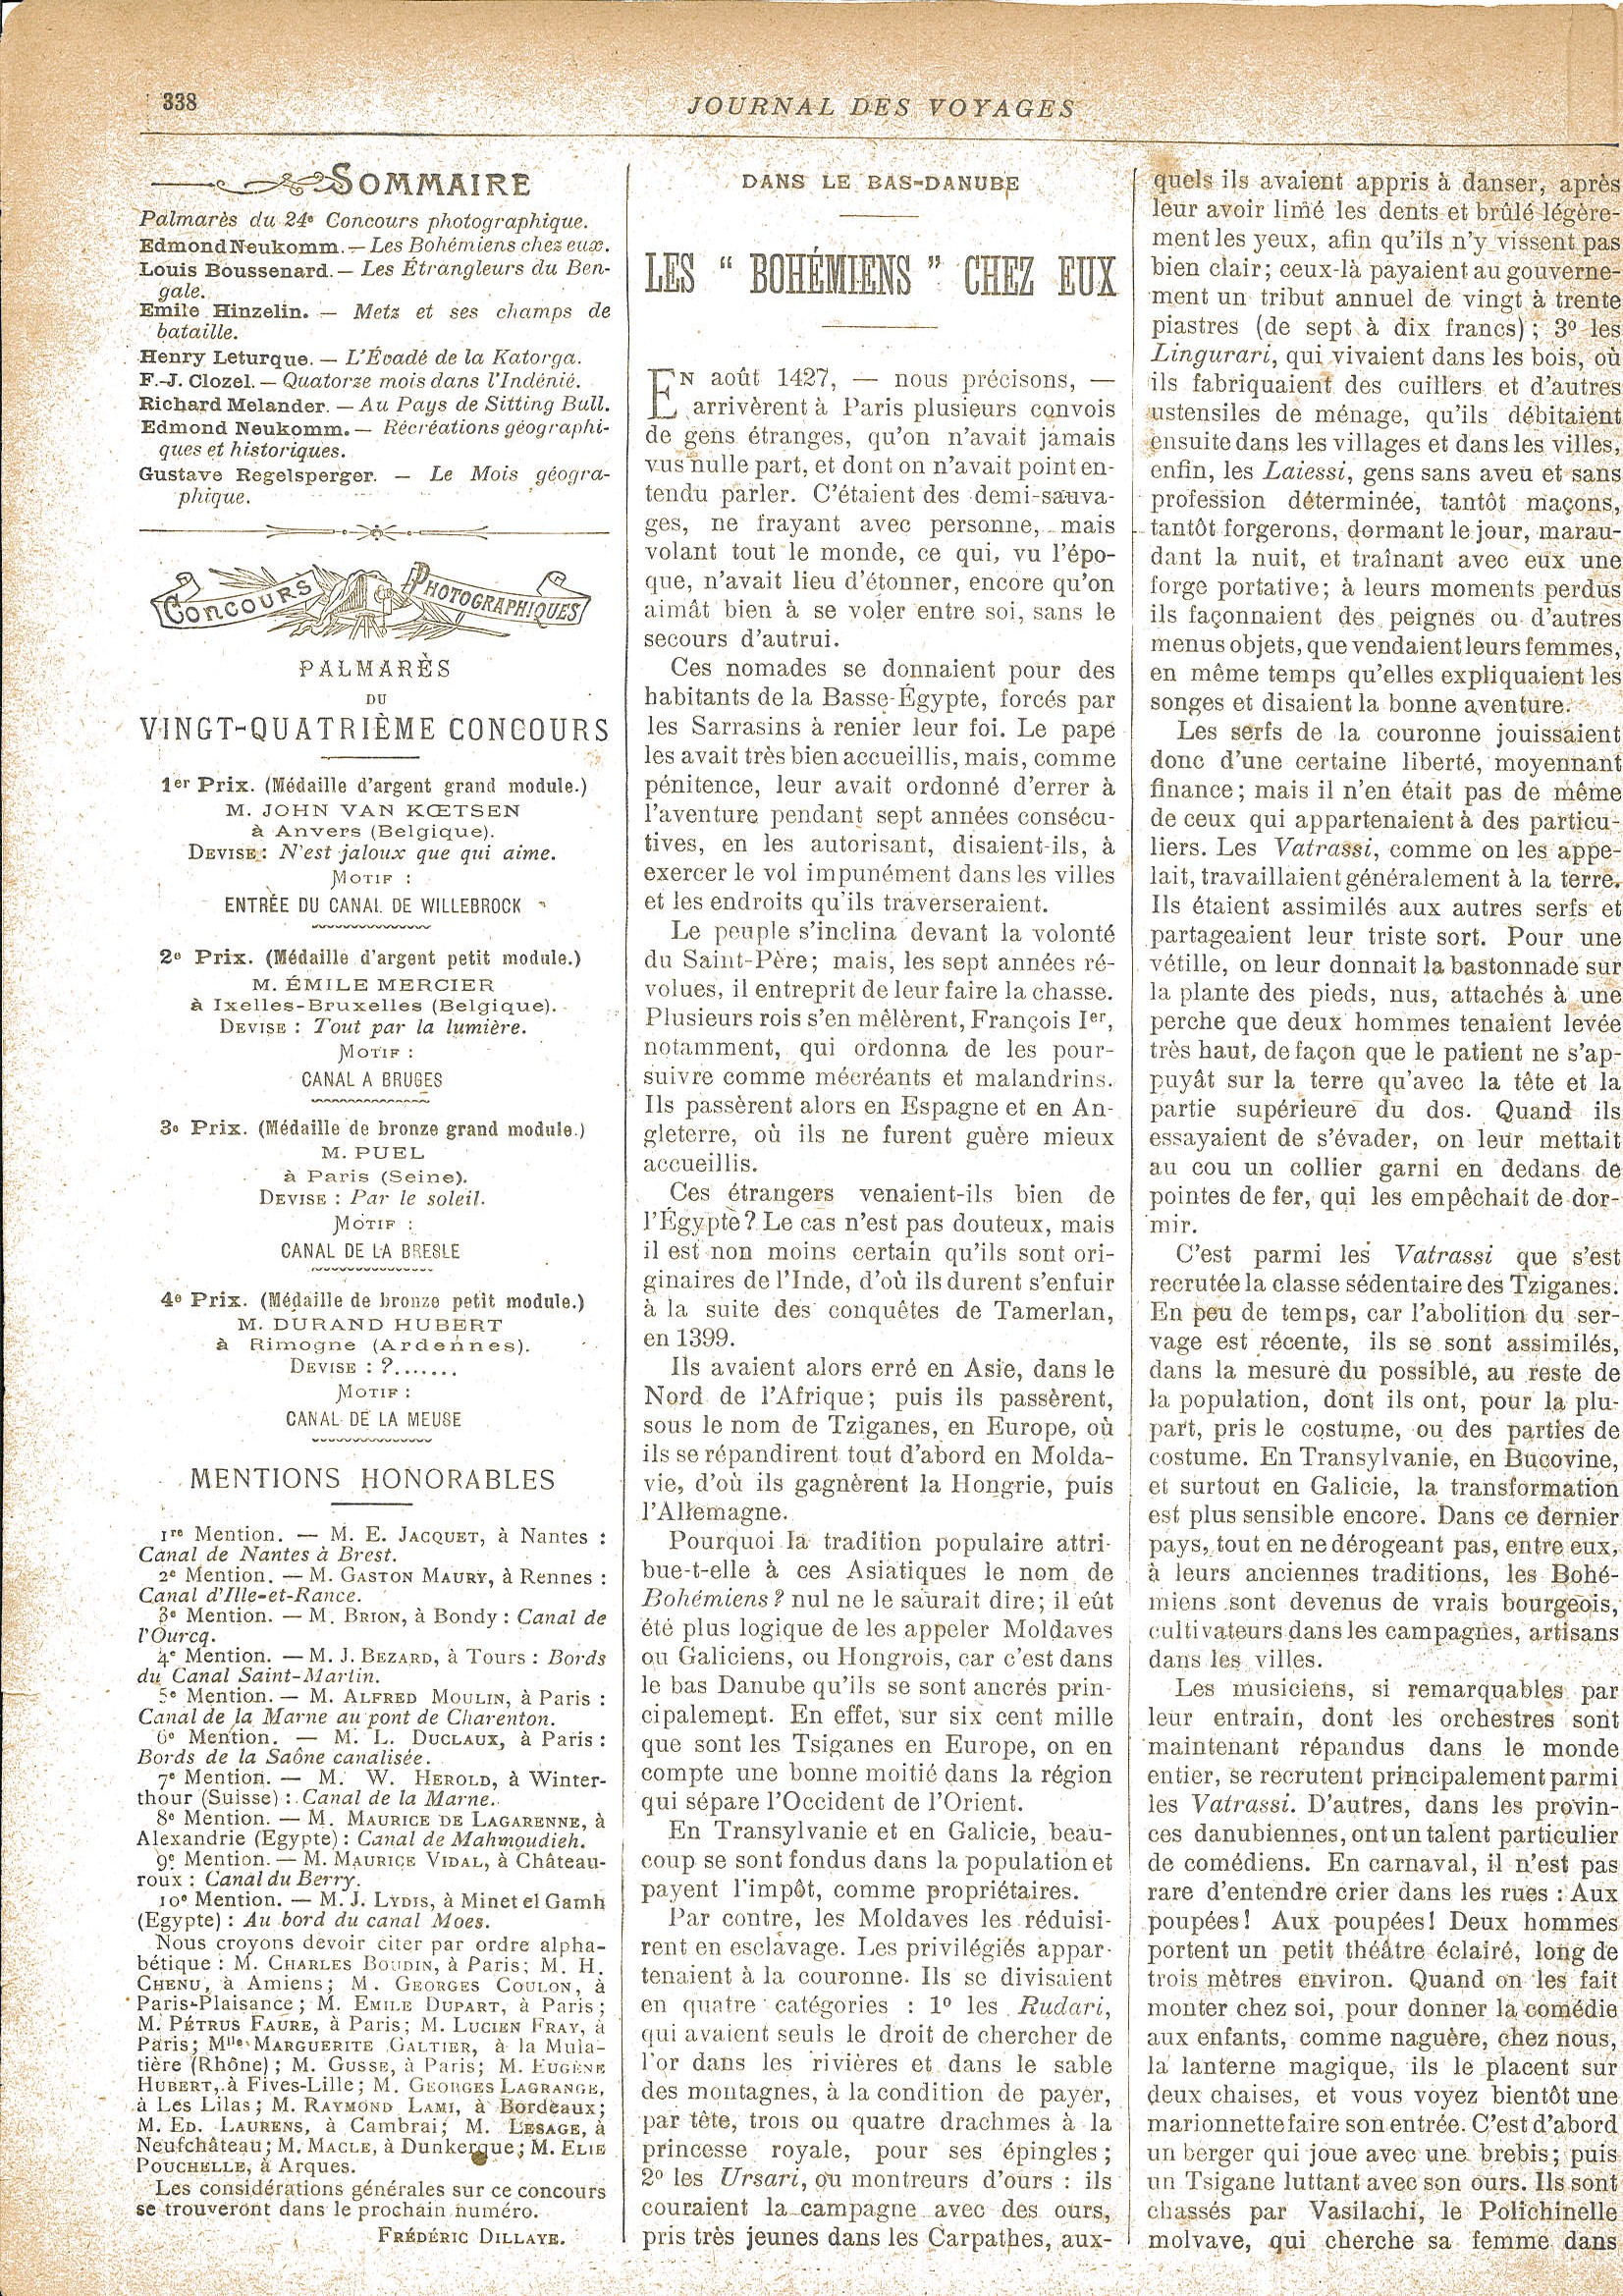 p.338.jpg - image/jpeg